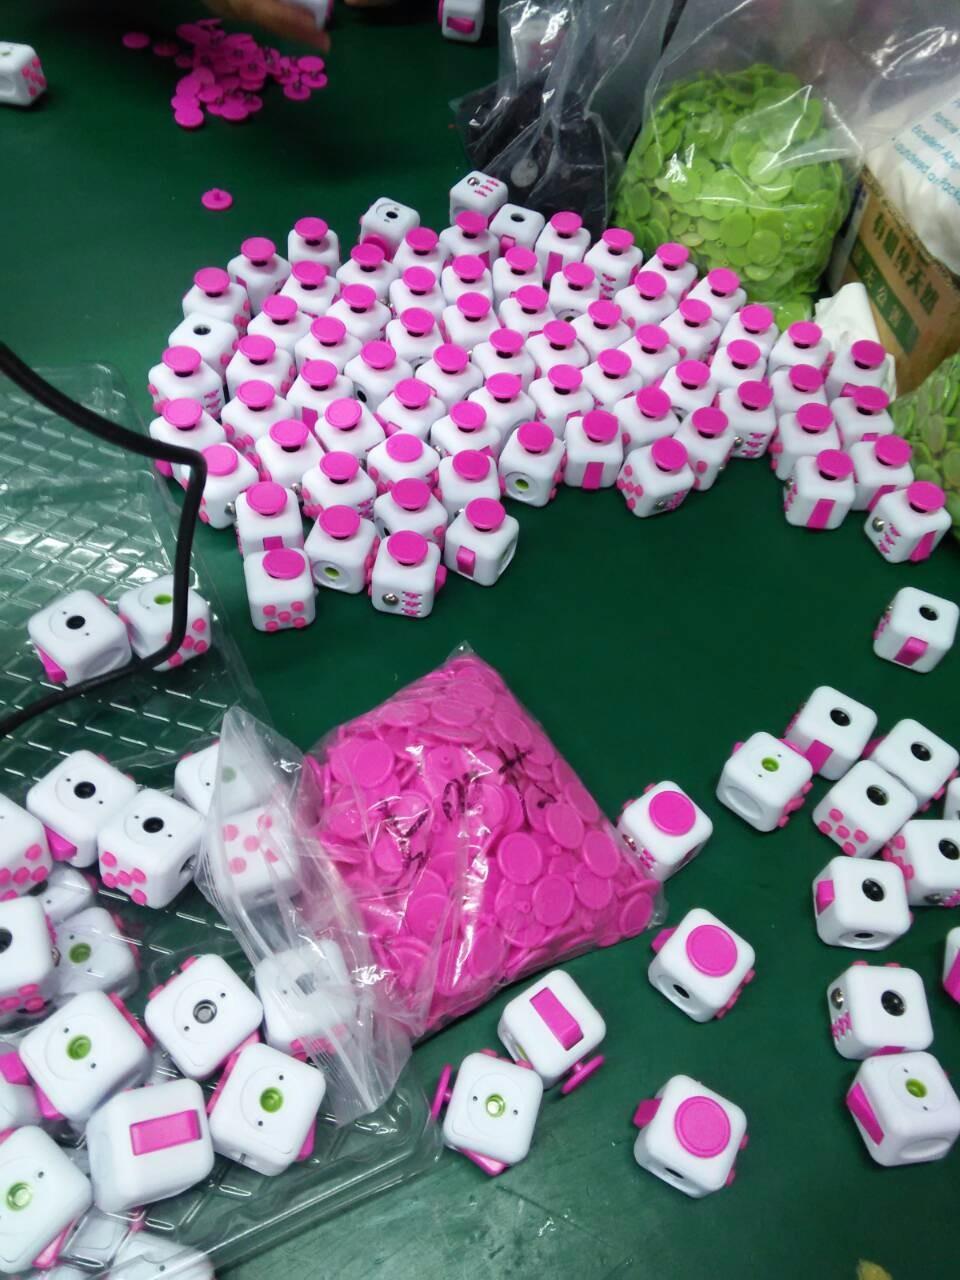 Fidget Cube For Boring Releasing Stress Fidget Cube For Boring